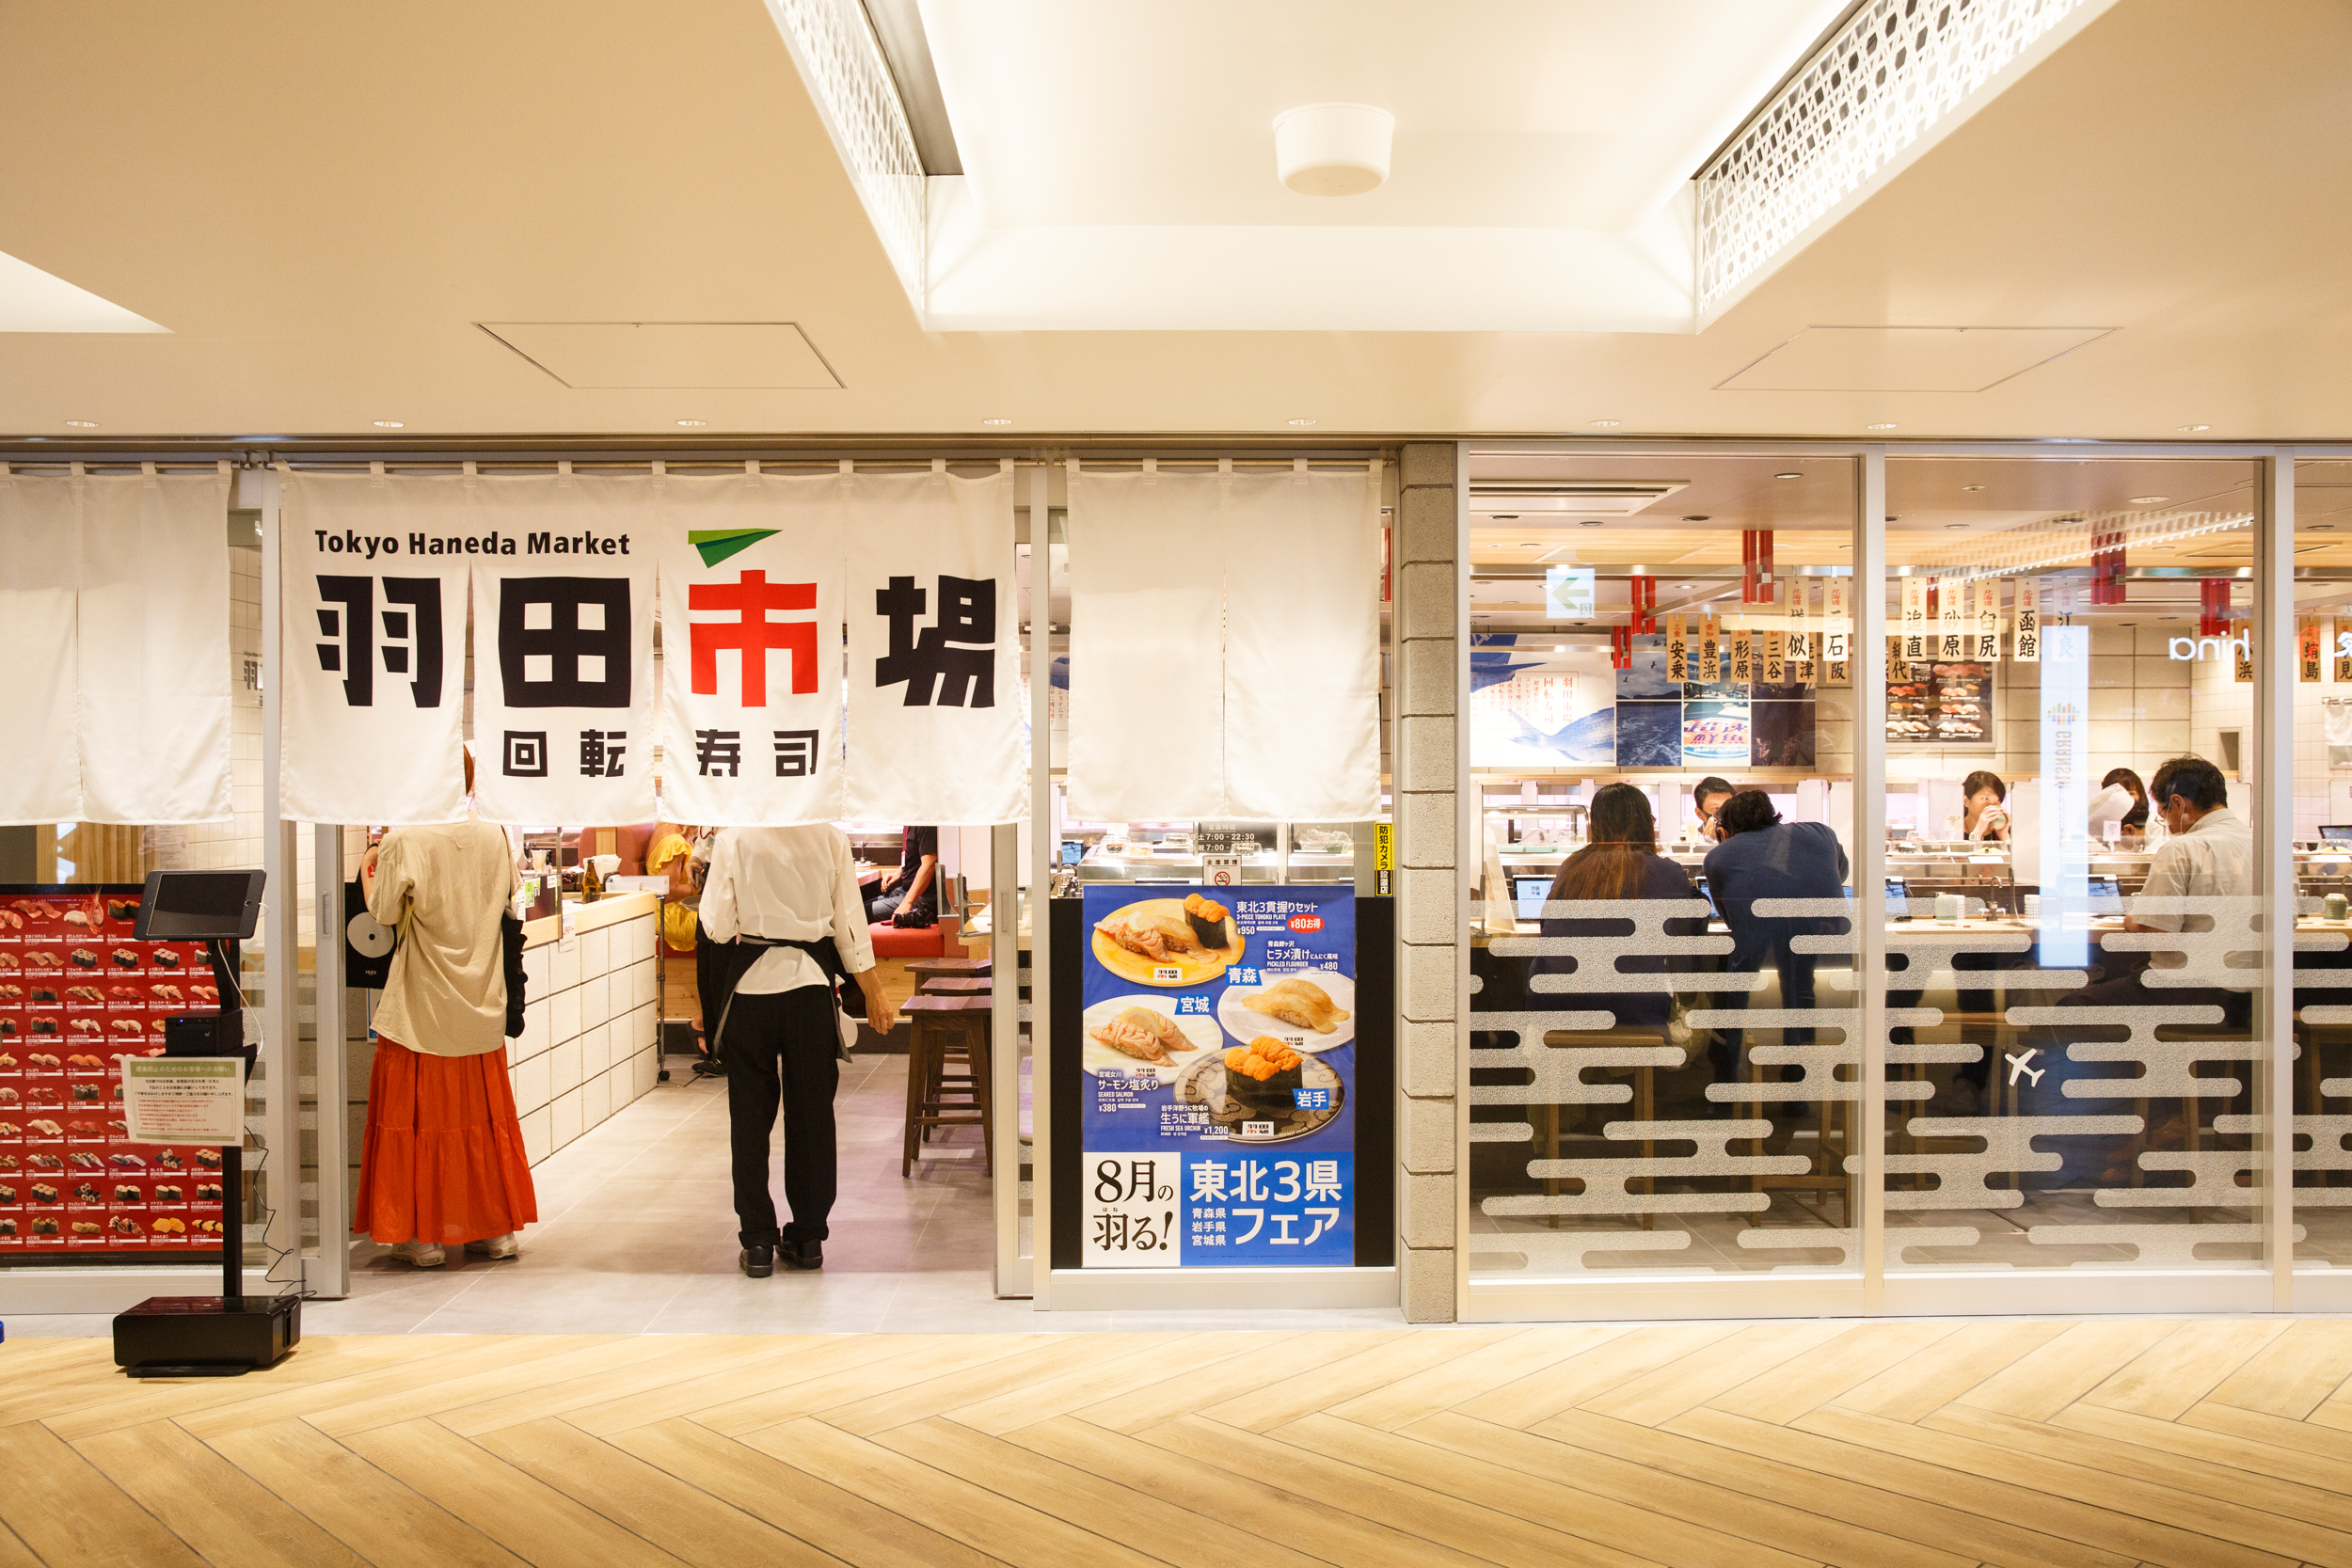 Haneda Ichiba 回転寿司 羽田市場